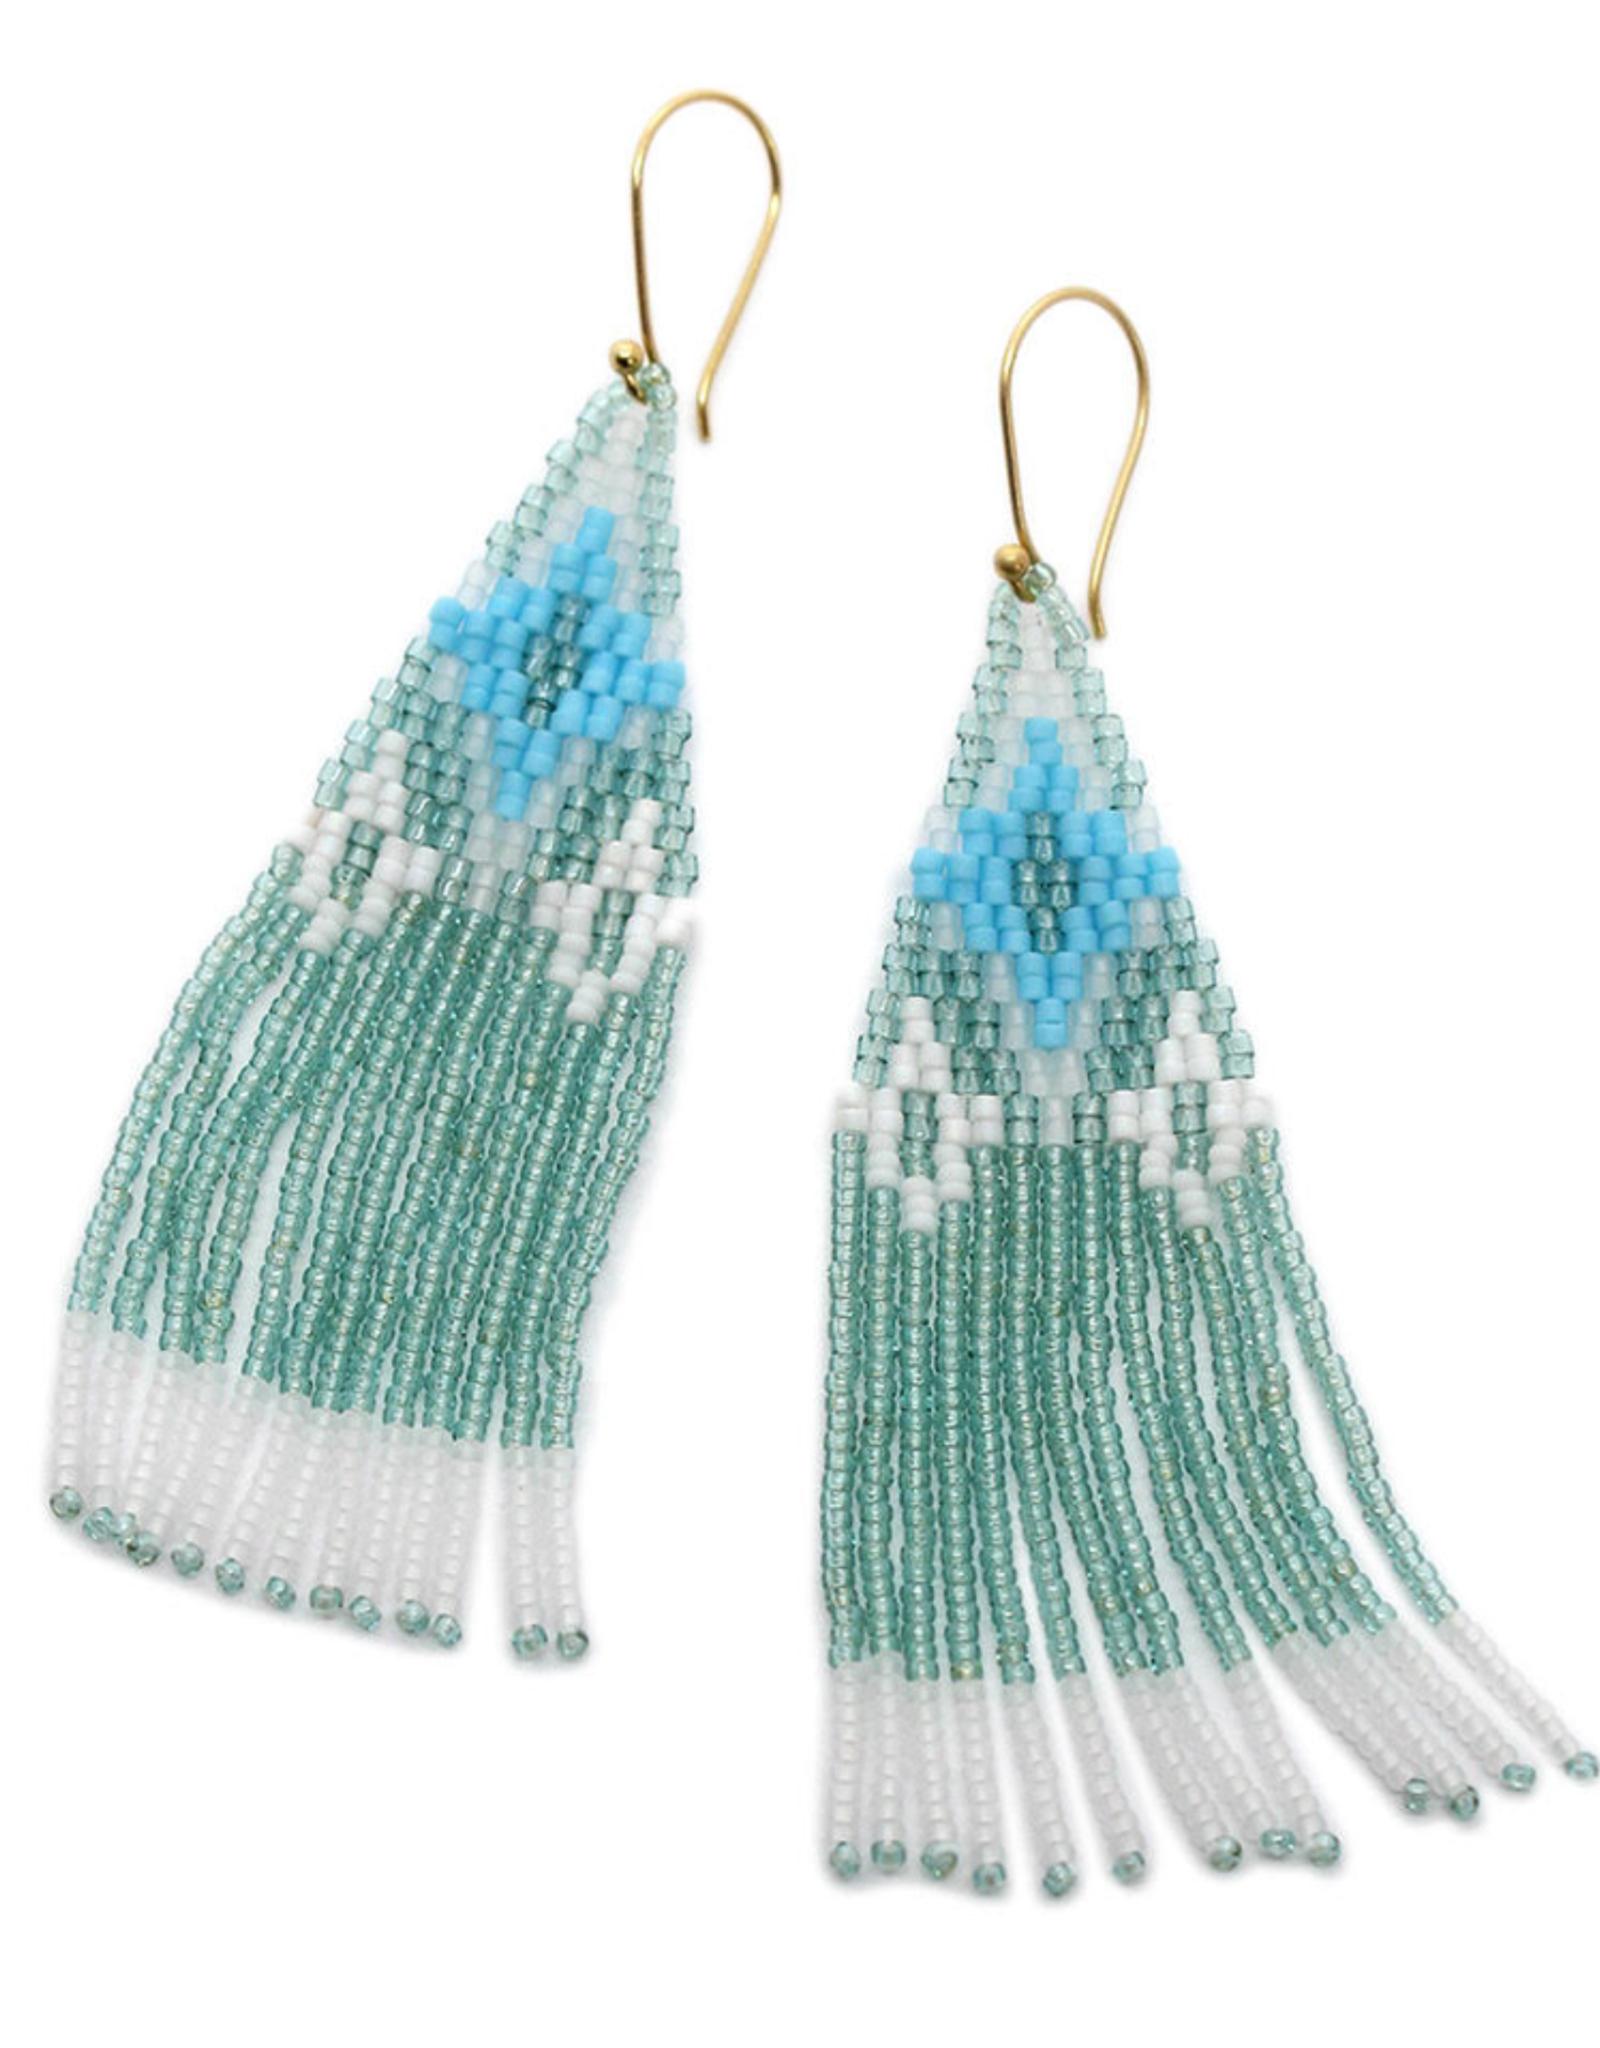 BLUMA PROJECT EARRING DANGLE OJAI SAGE GREEN WHITE AND BLUE